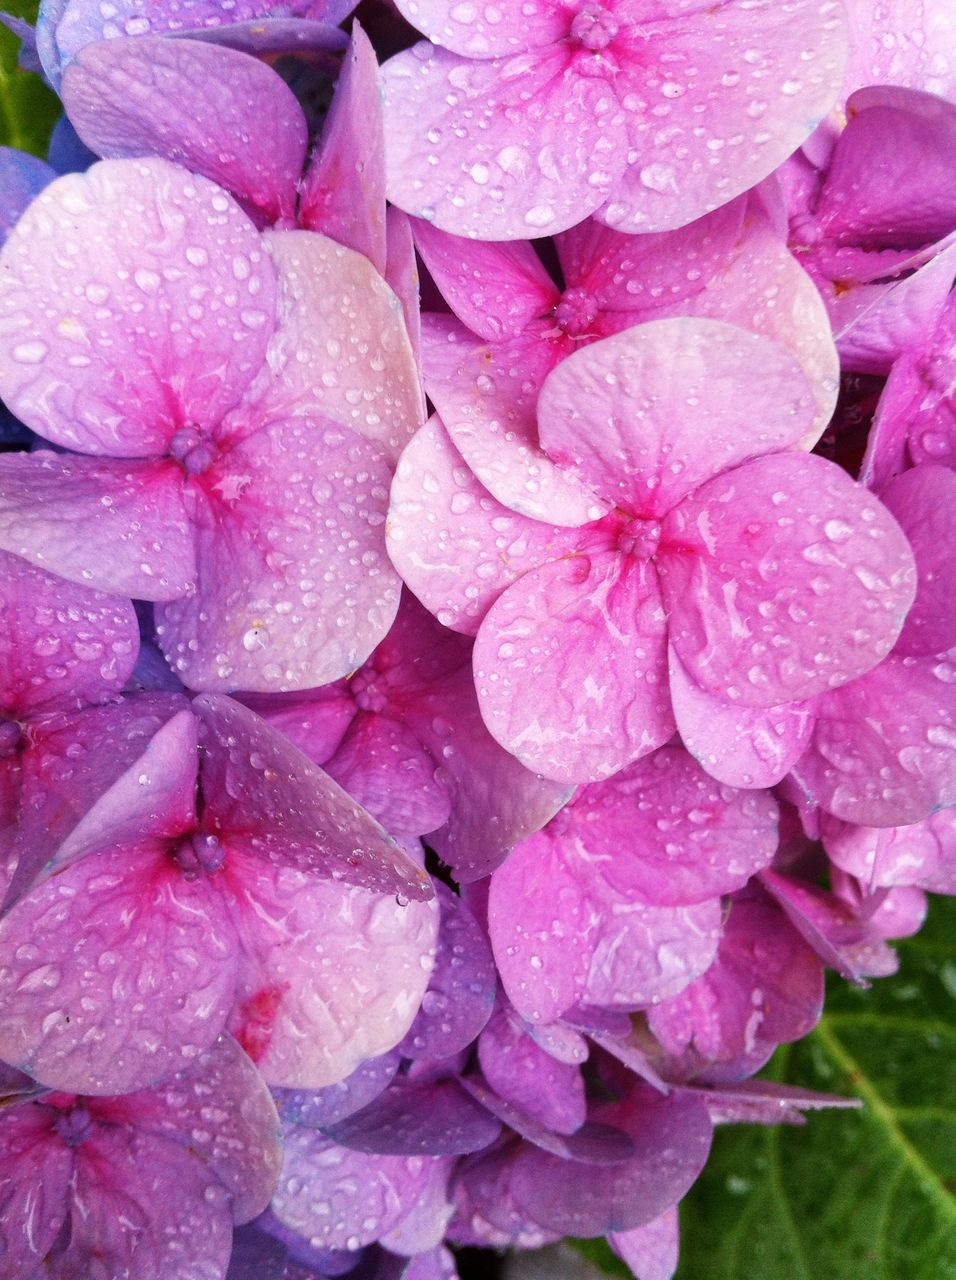 Water Drops On Pink Flowers In Garden